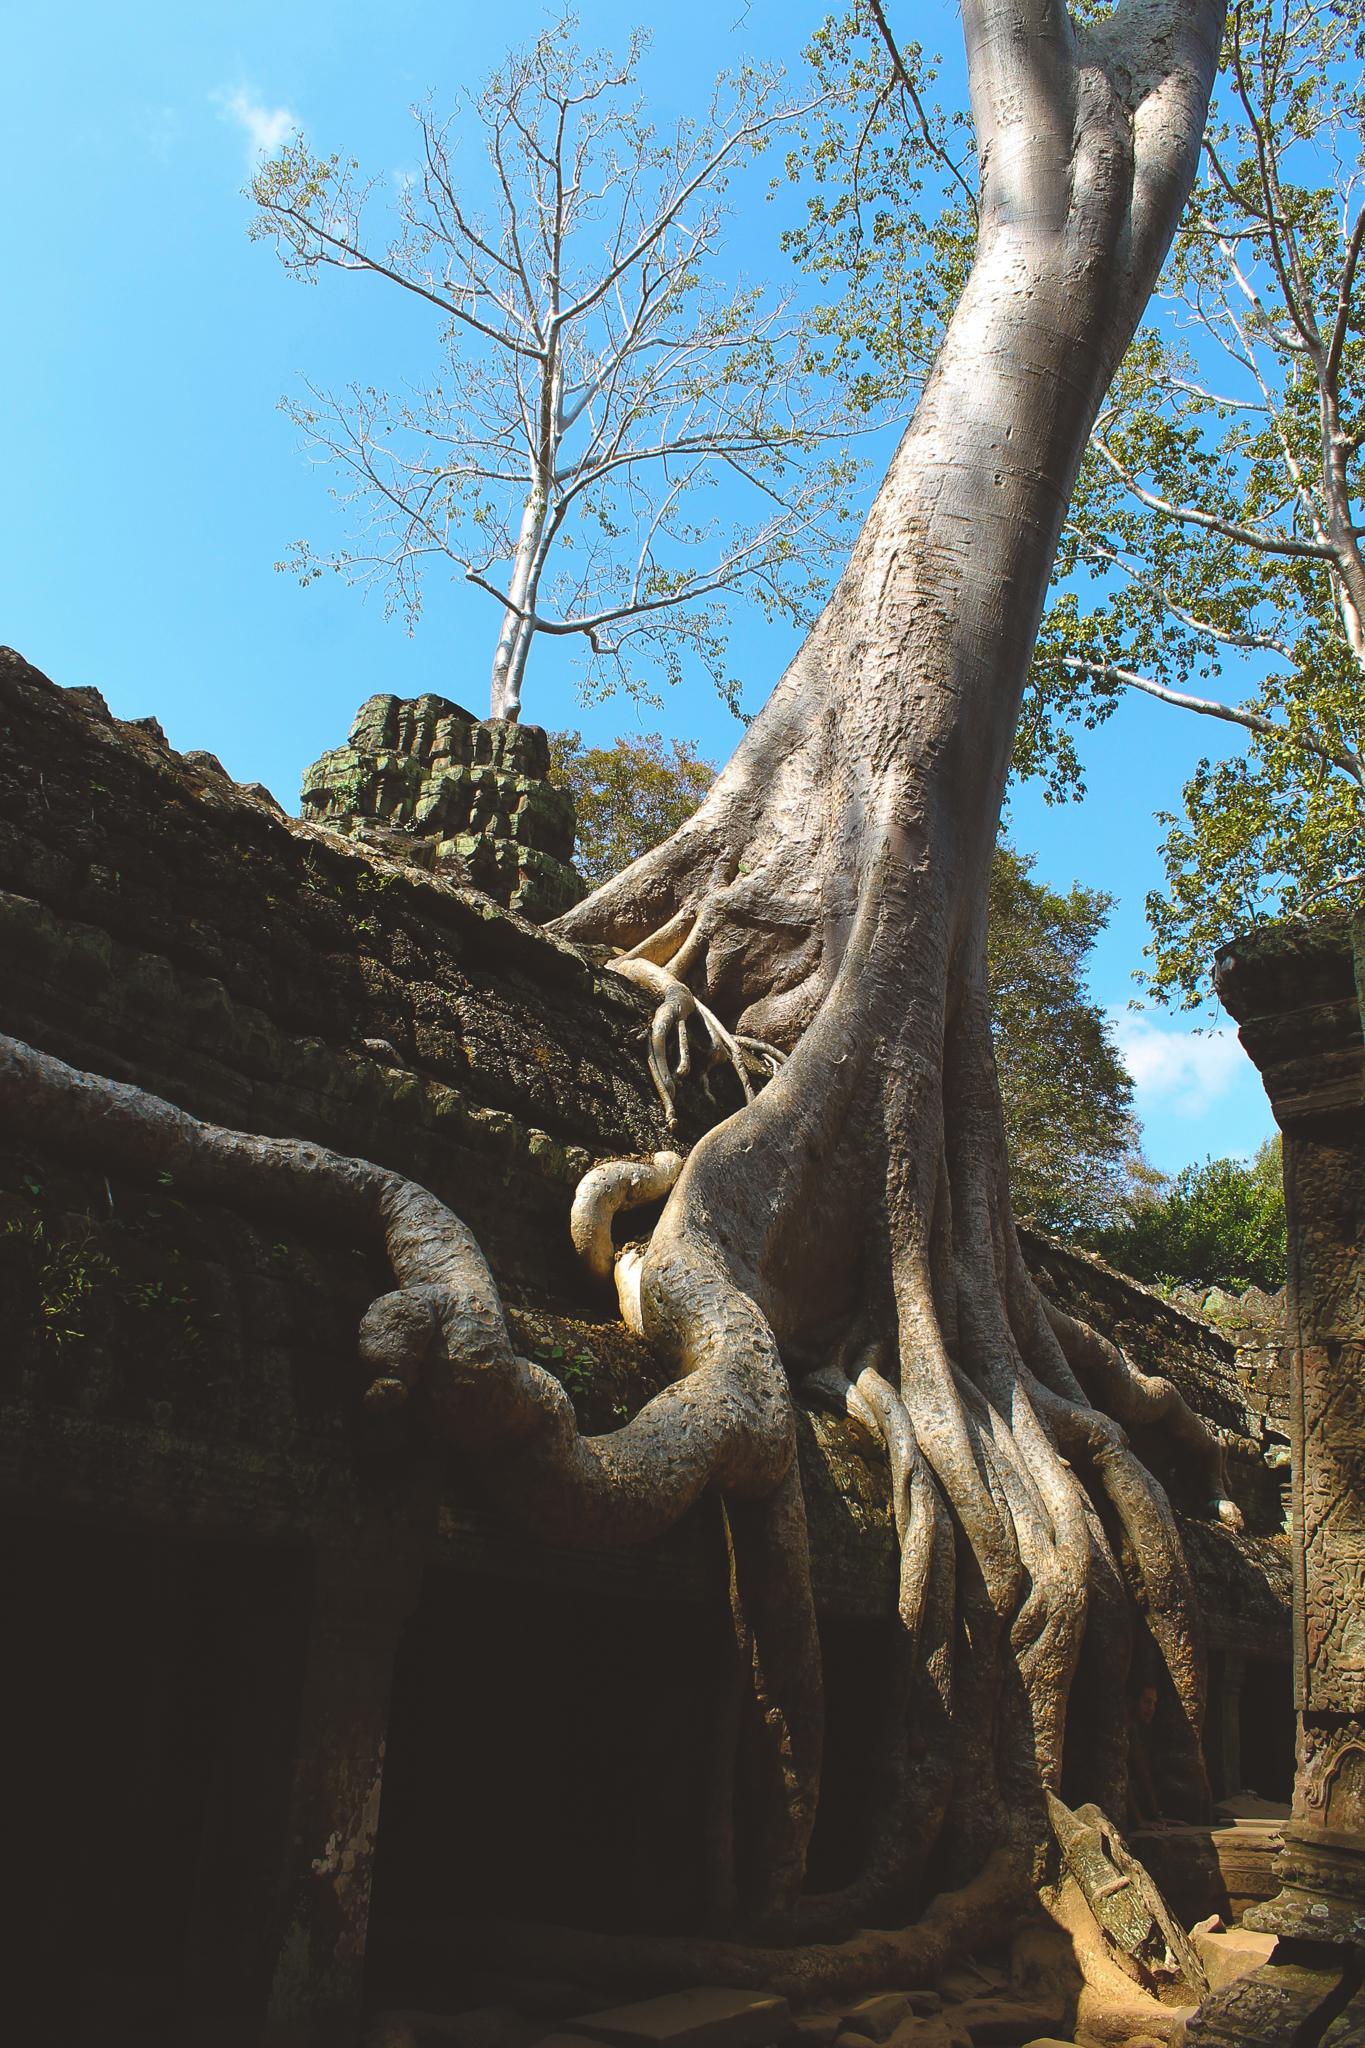 cambodia blog (18 of 34).jpg